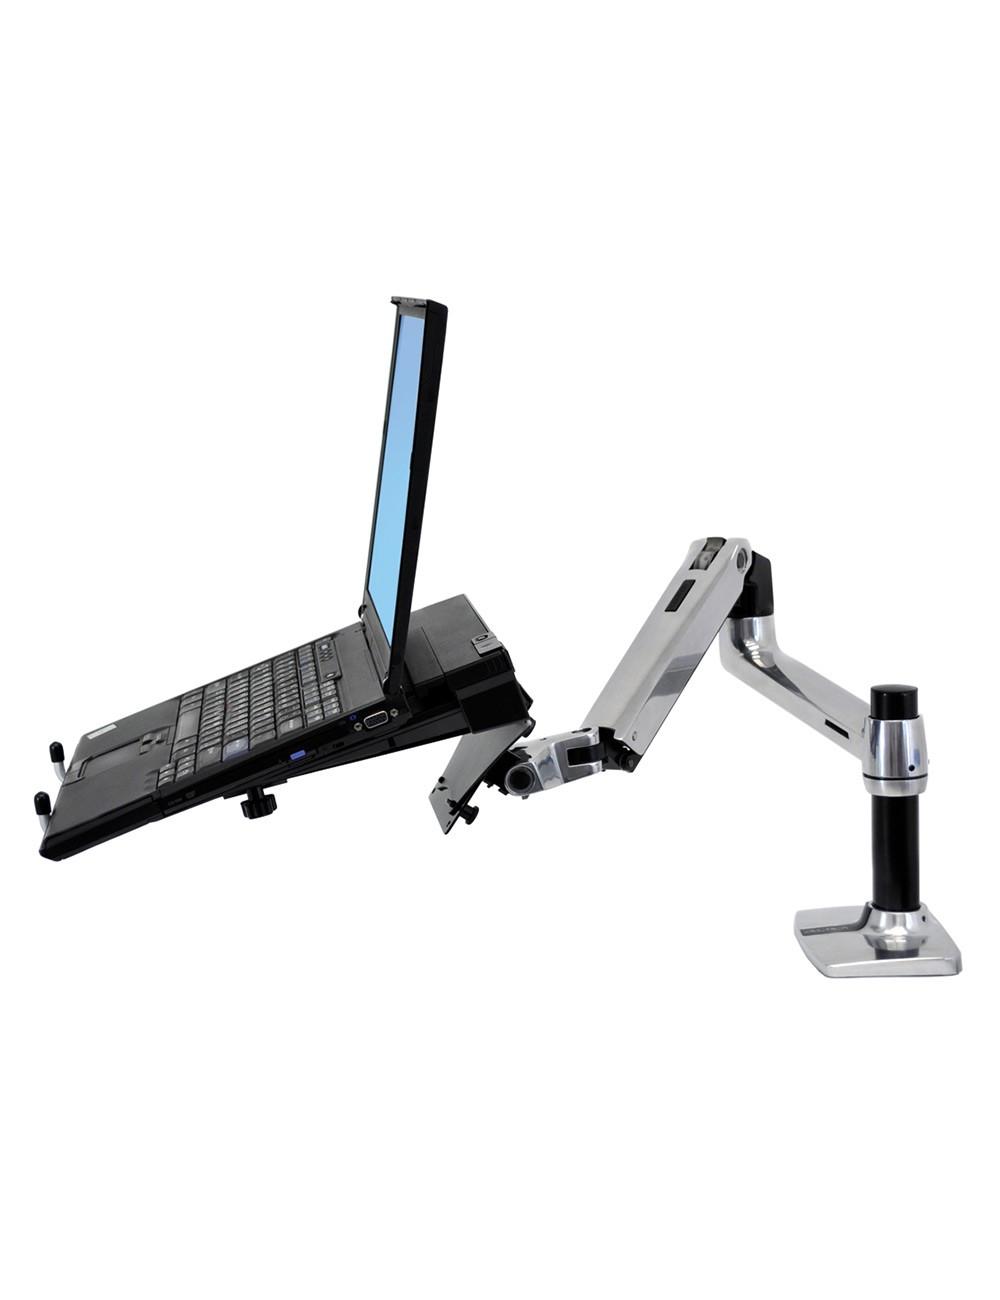 Ergotron LX Desk Mount Notebook Arm Sleek and streamlined